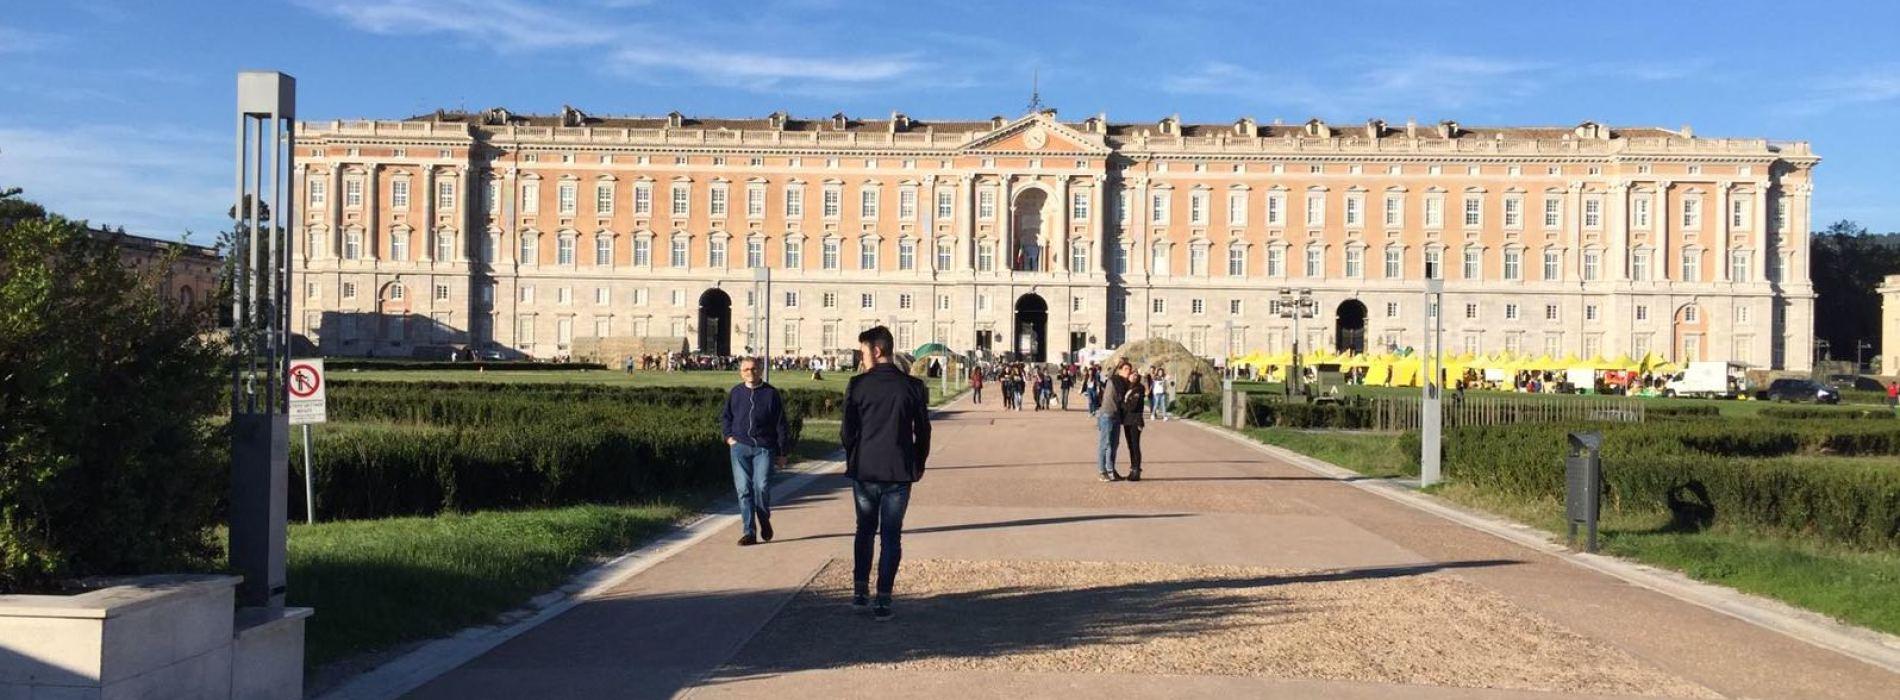 Reggia di Caserta, a Pasqua e Lunedì in Albis visite limitate